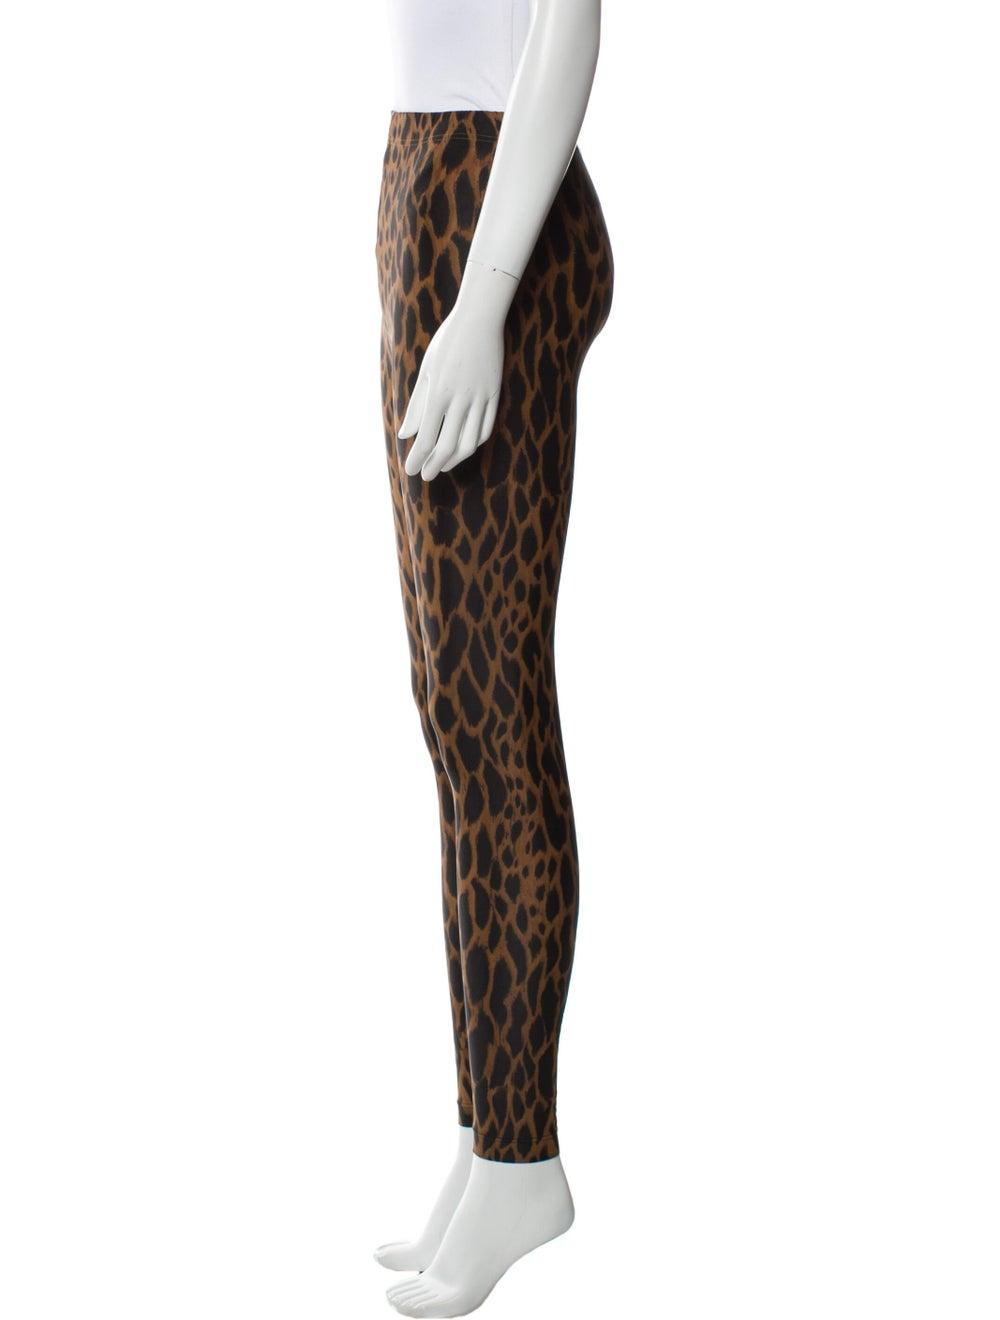 Gianni Versace Vintage Skinny Leg Pants - image 2